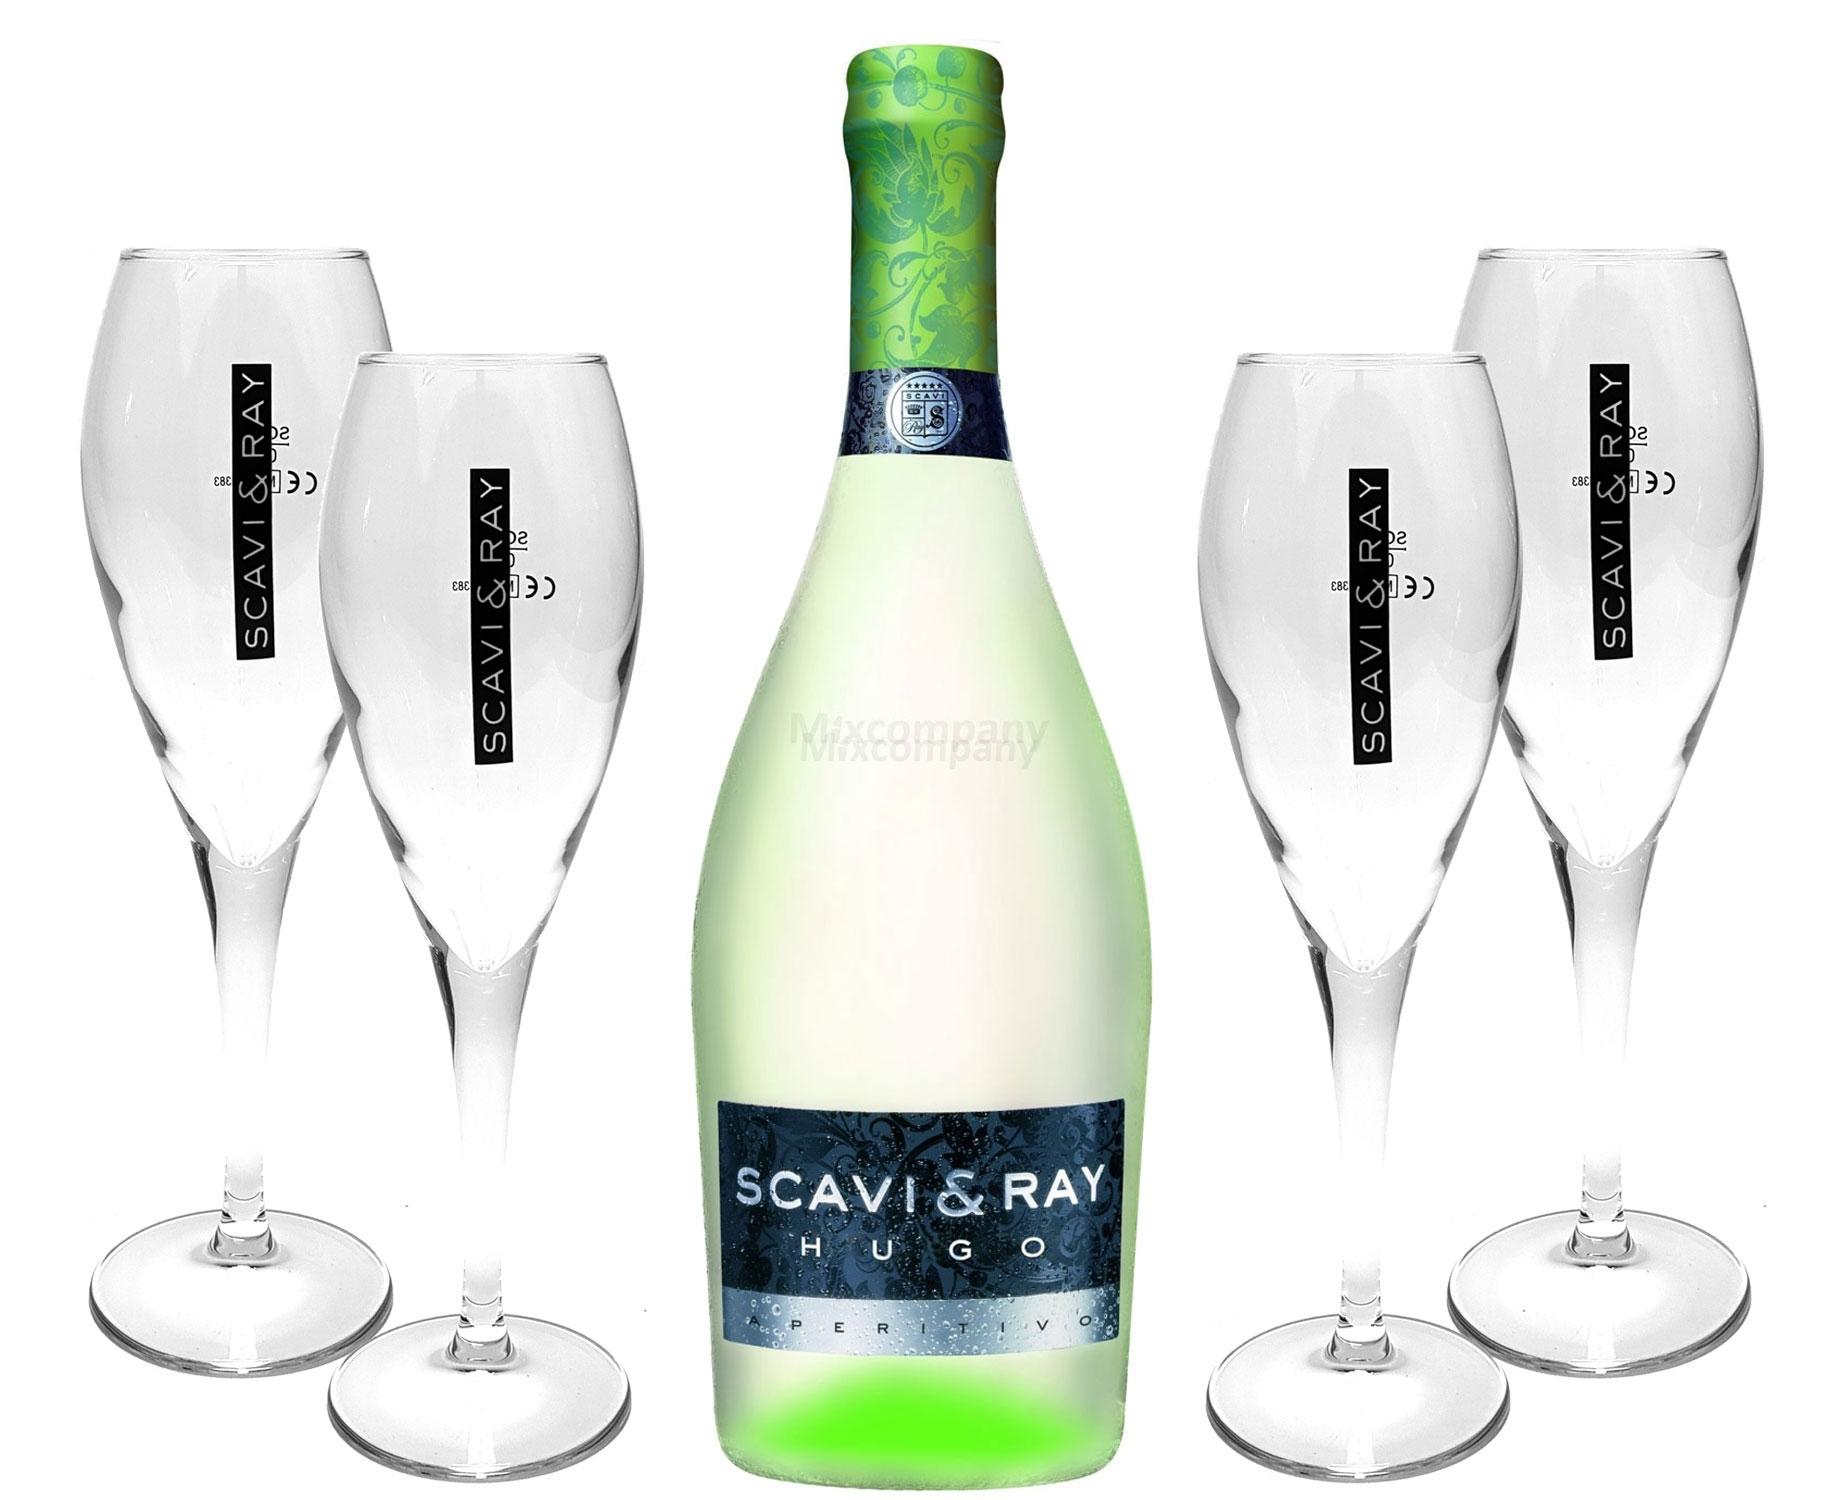 Scavi & Ray Hugo Aperitivo 0,75l (6% Vol) + 4x Flöten (10cl) -[Enthält Sulfite]